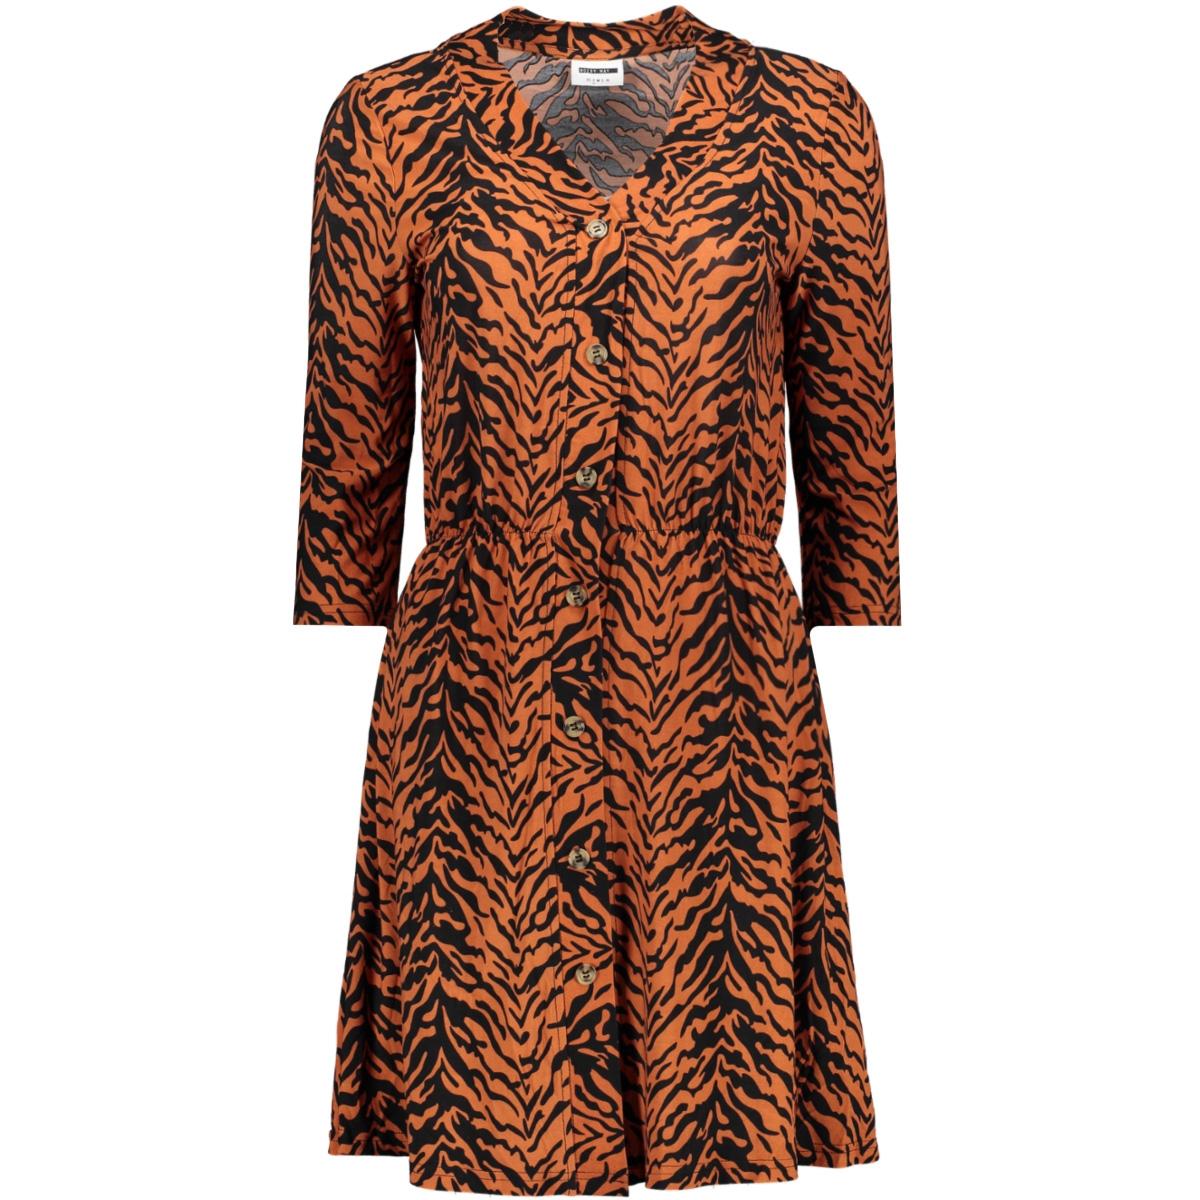 nmsally 3/4 sleeve short dress x4 27007749 noisy may jurk black/auburn/black